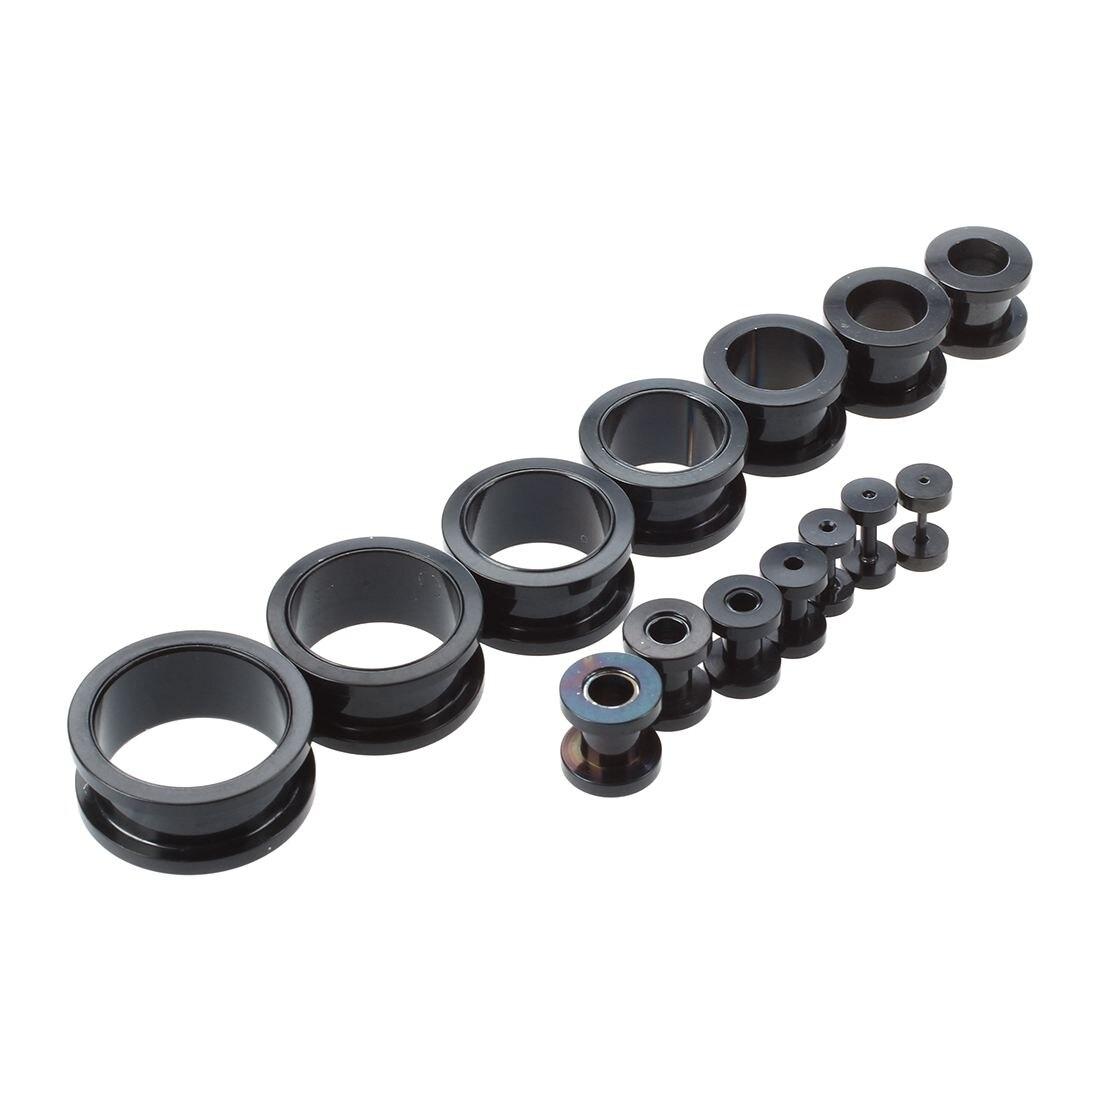 Set 14 ear taper stretcher Expander Plug black in stainless steel 316L